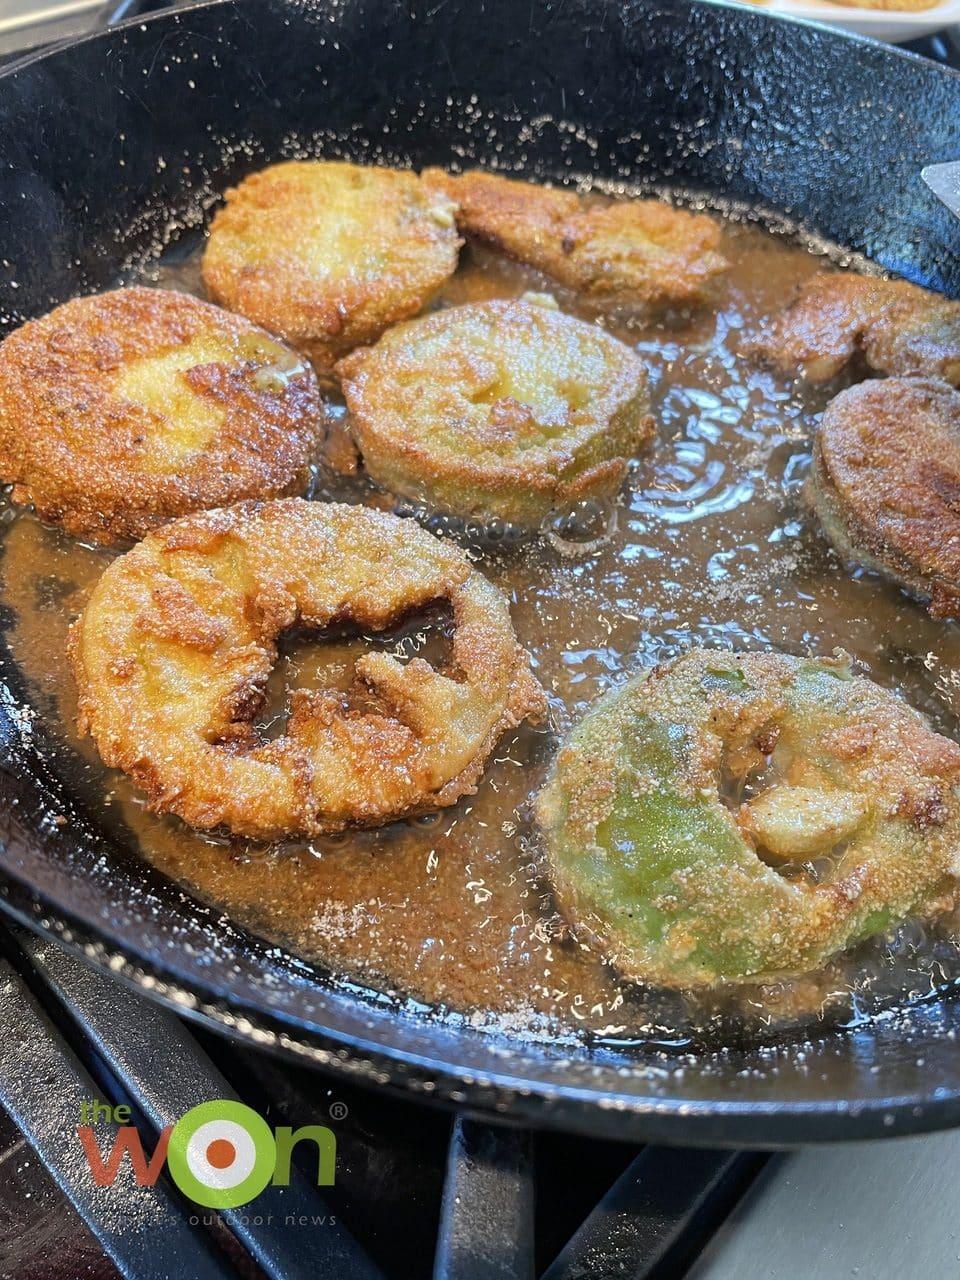 Paula Deen fried green tomaotes